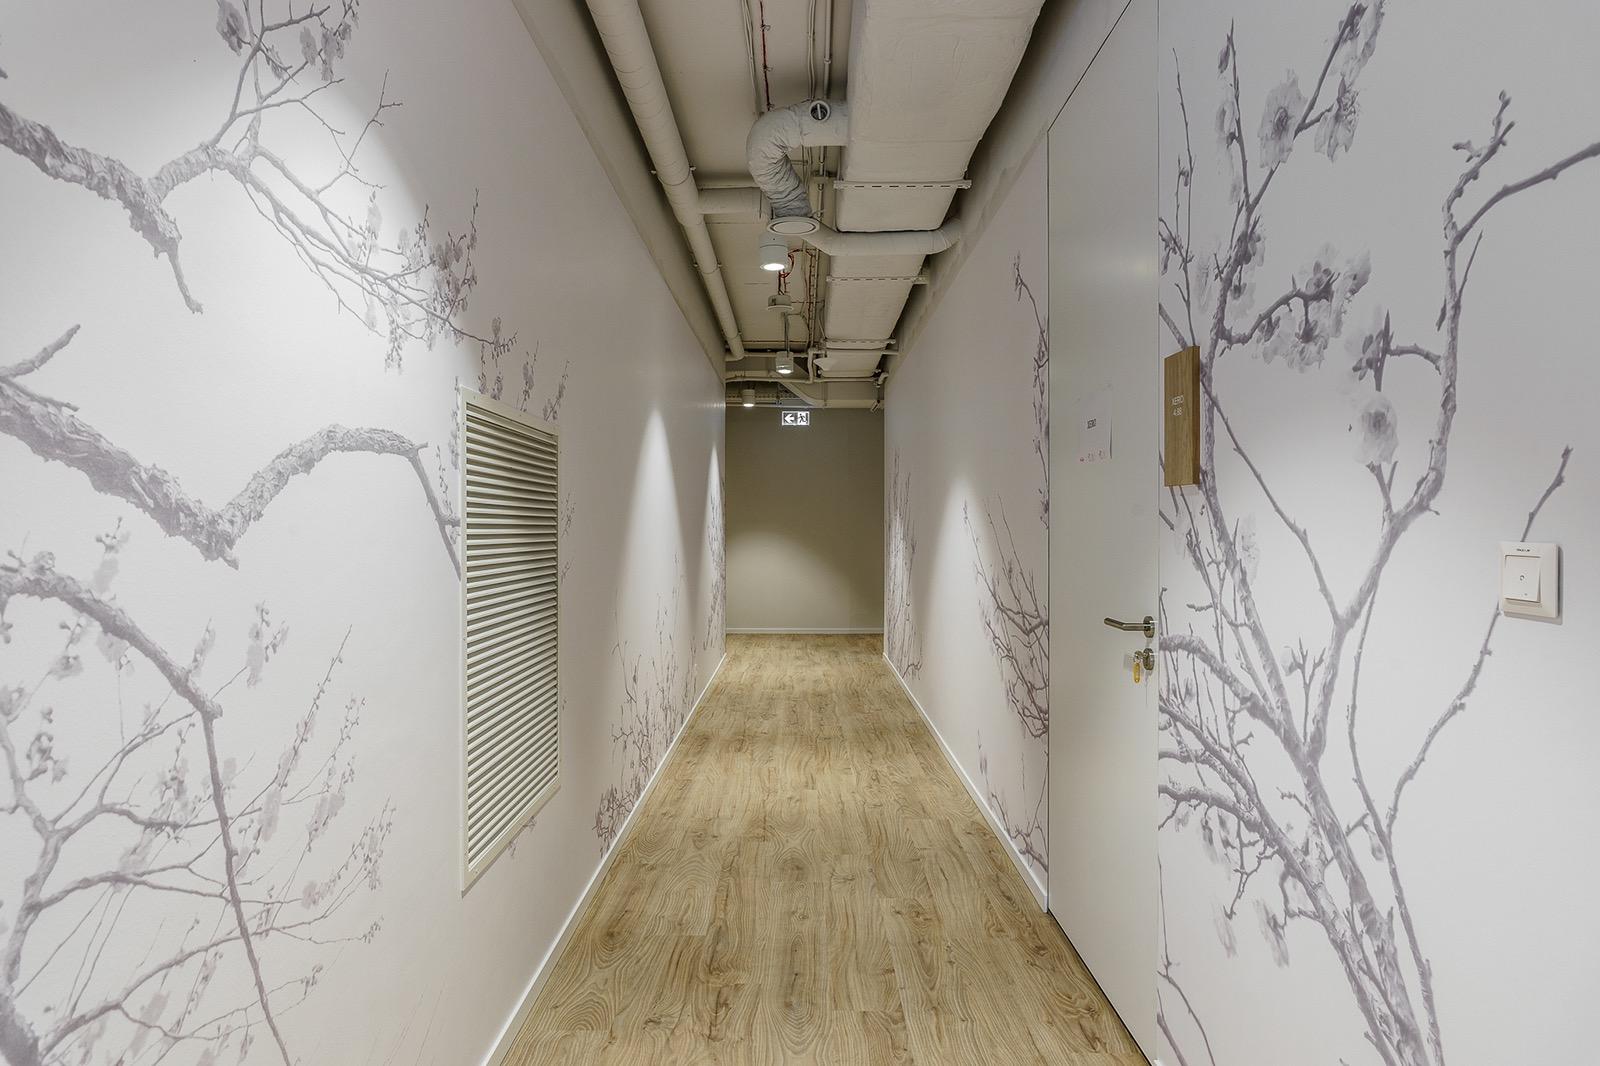 takeda-warsaw-office-6